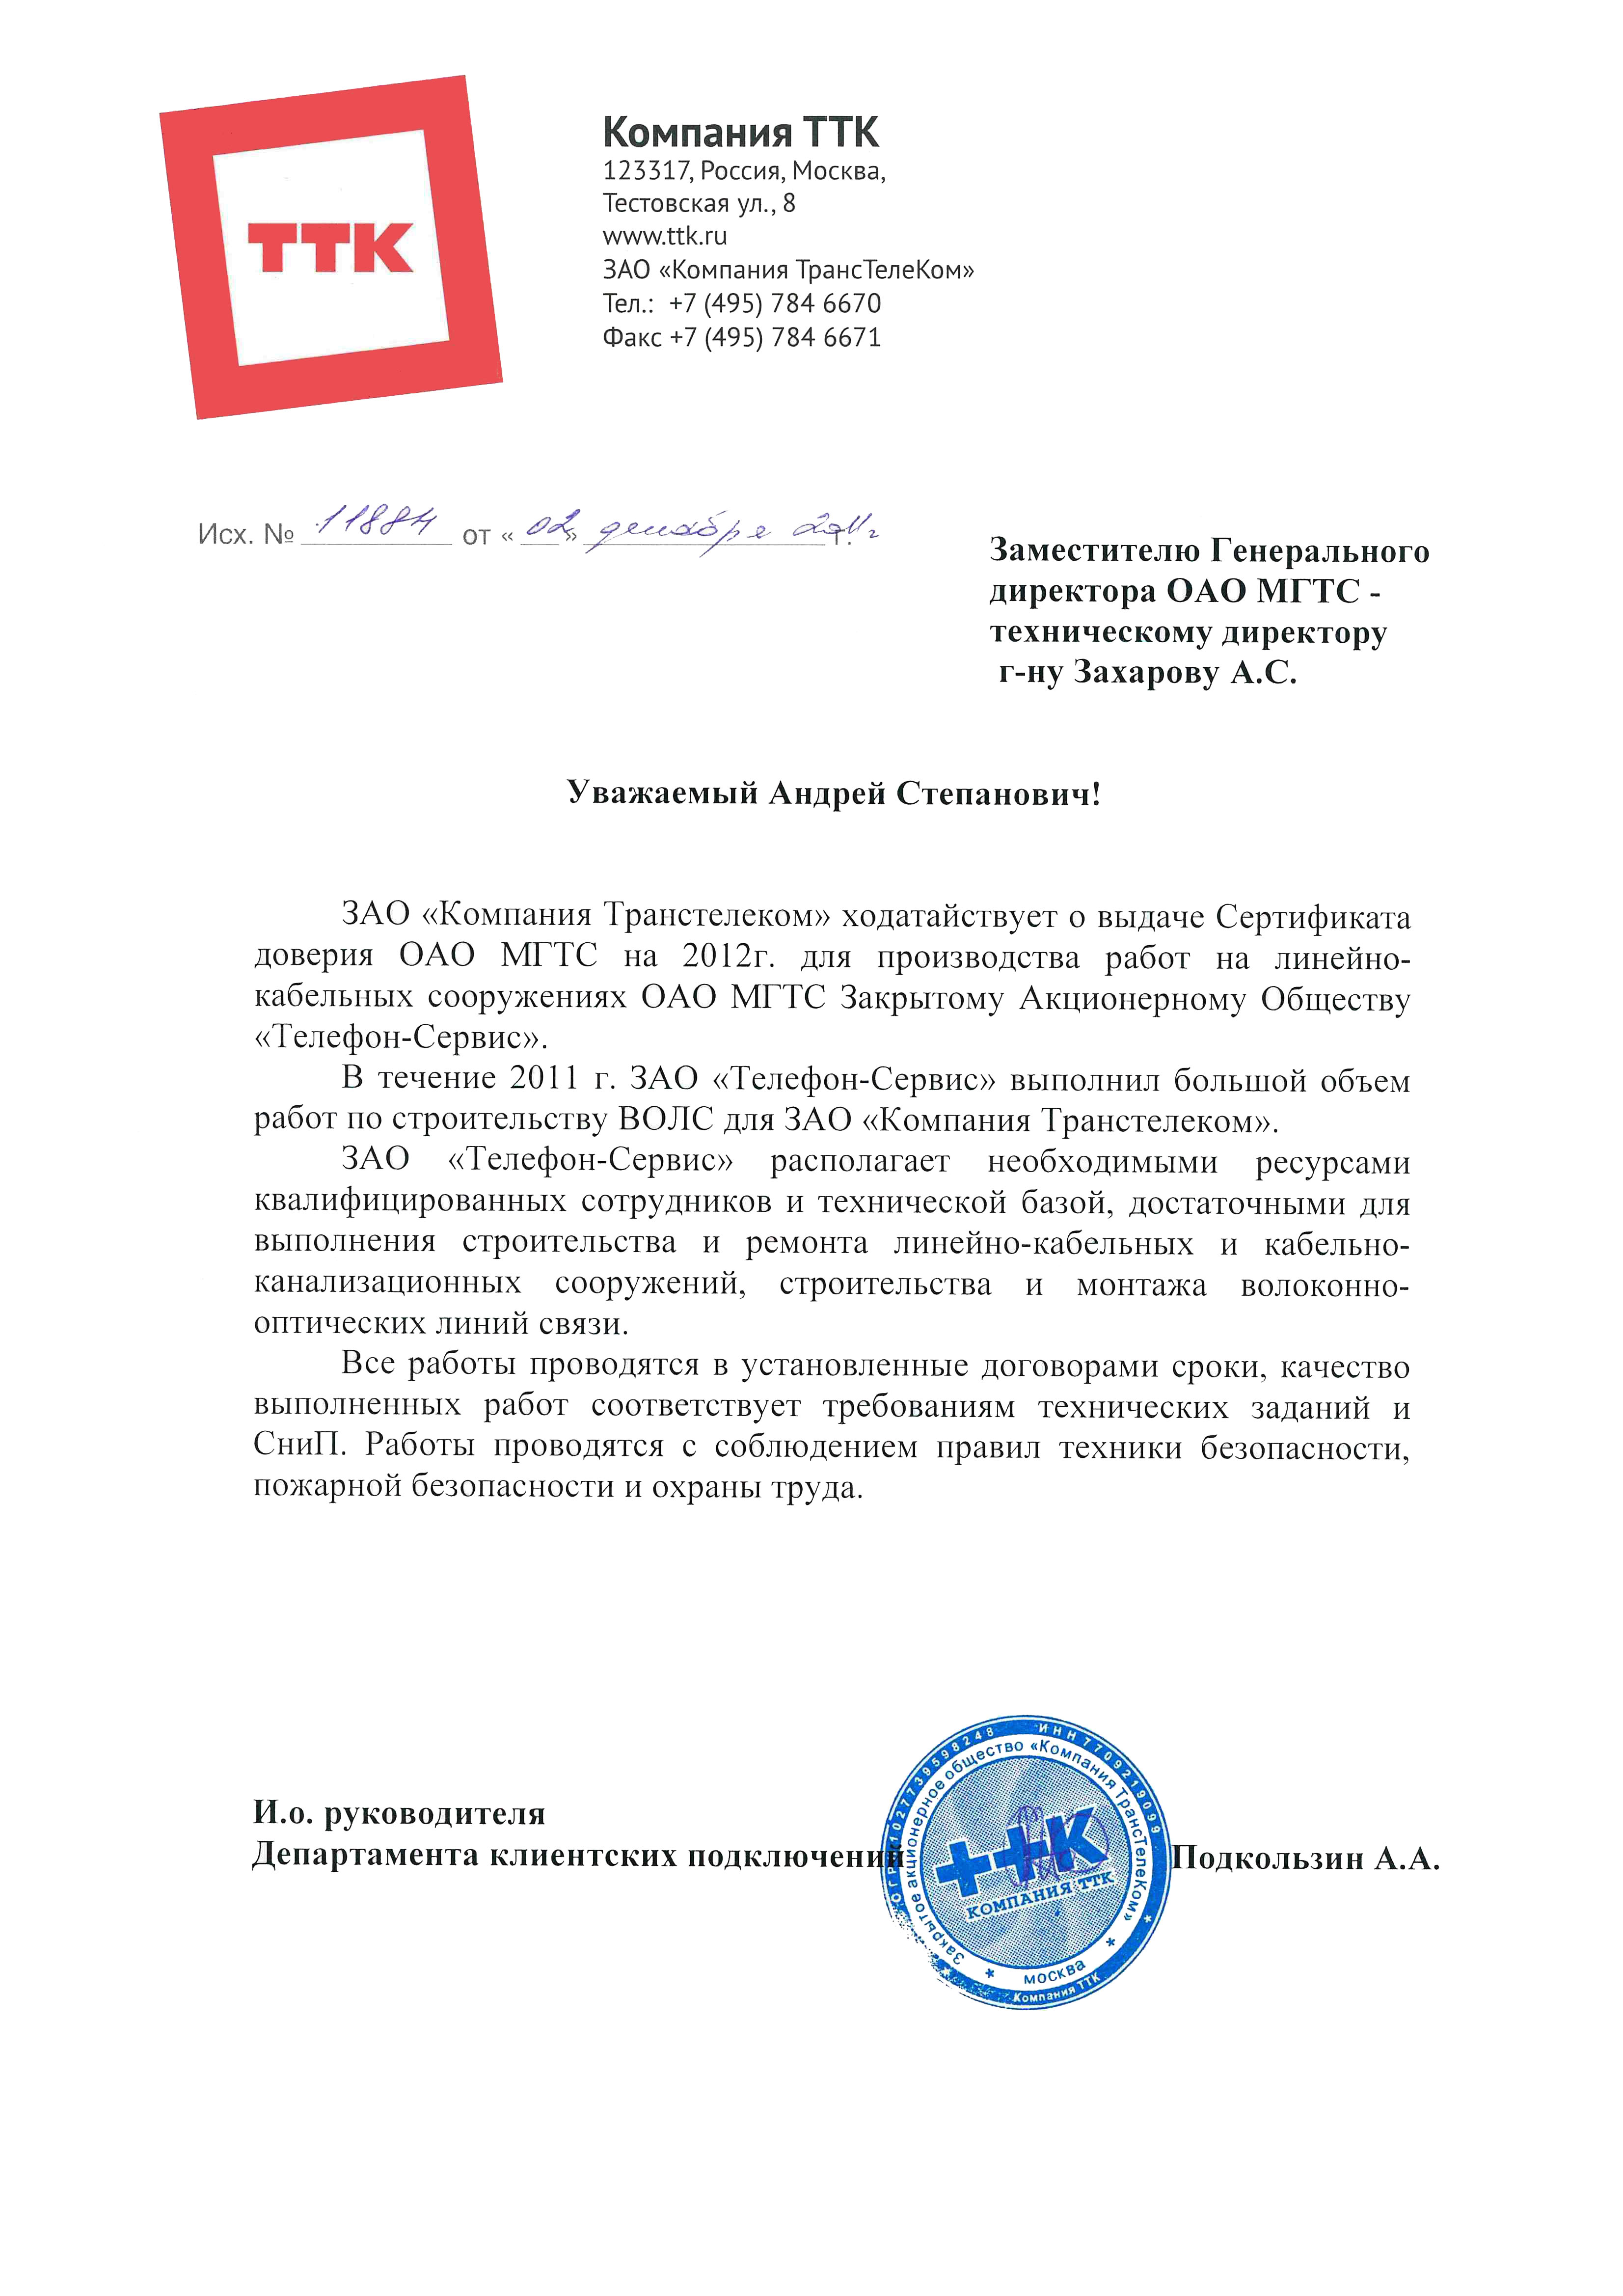 Москва mamba телефон зао компании